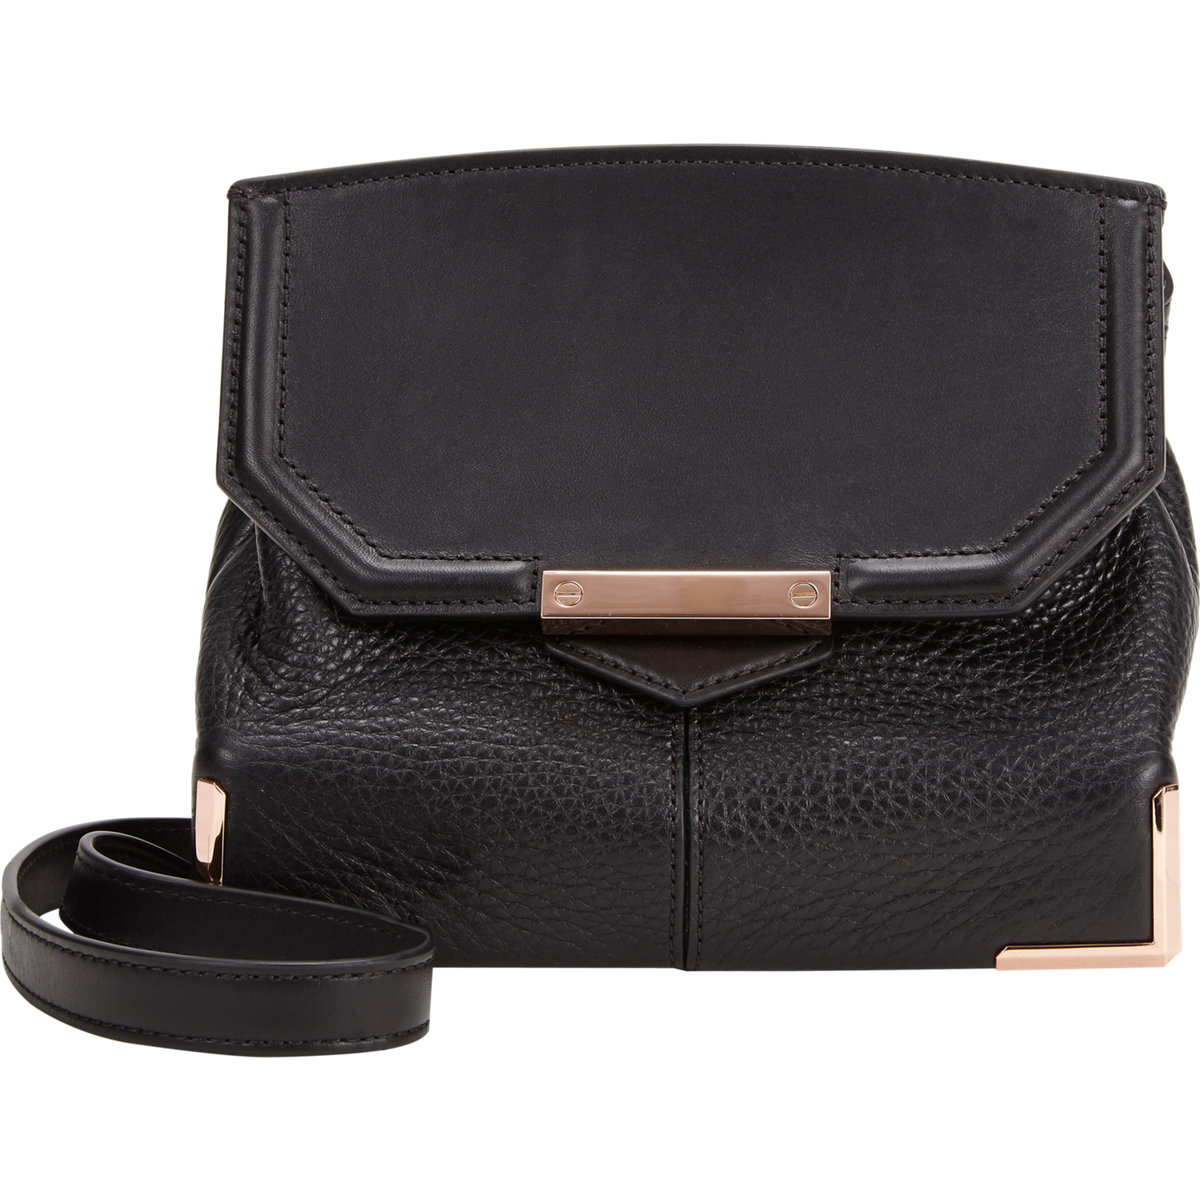 9520537df021a Lyst - Alexander Wang Marion Mini Sling Bag in Black